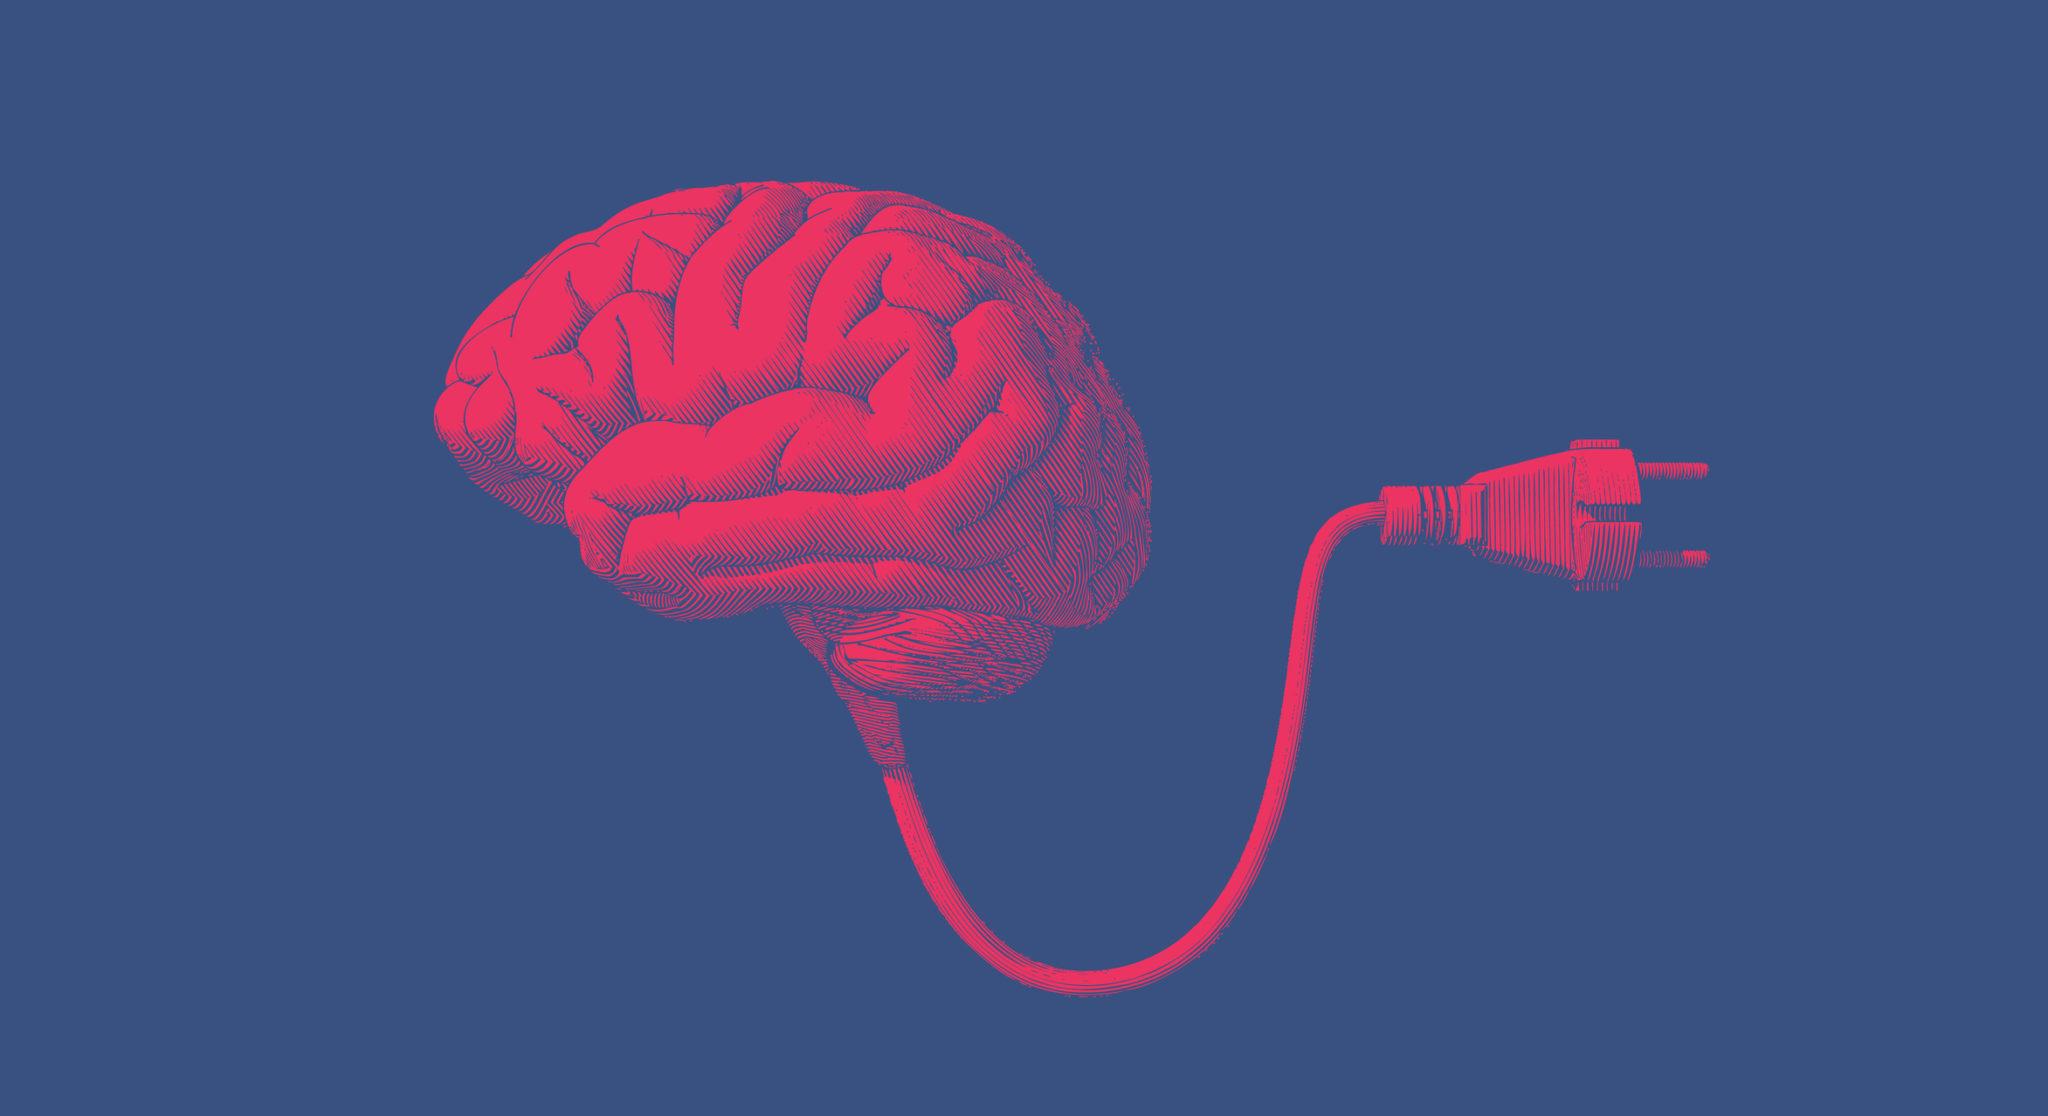 brain with plug grey matter vs white matter